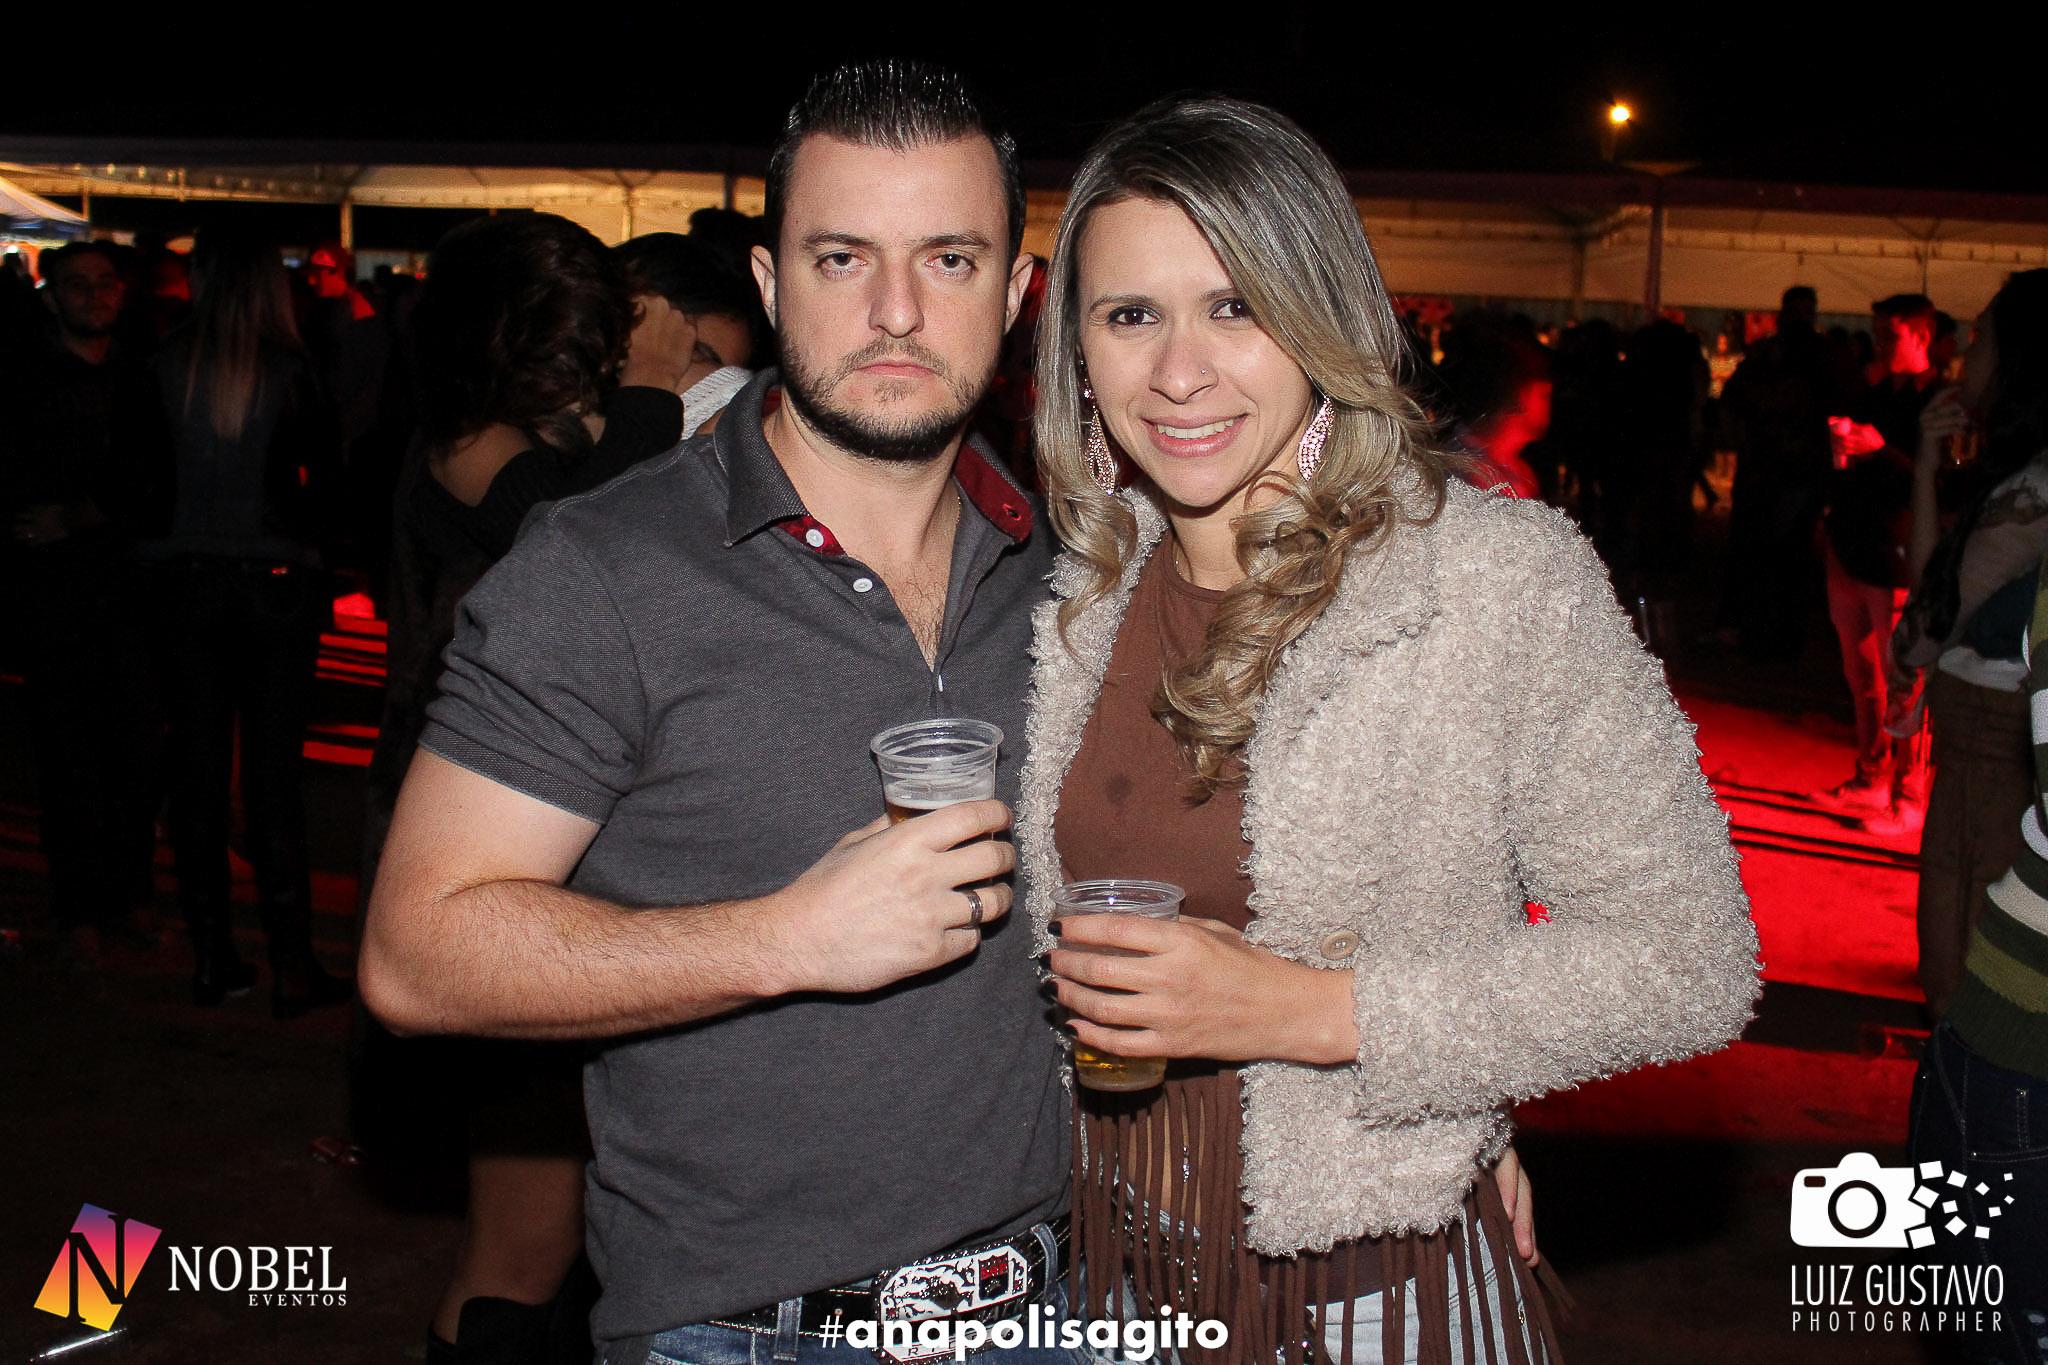 Luiz Gustavo Photographer-210